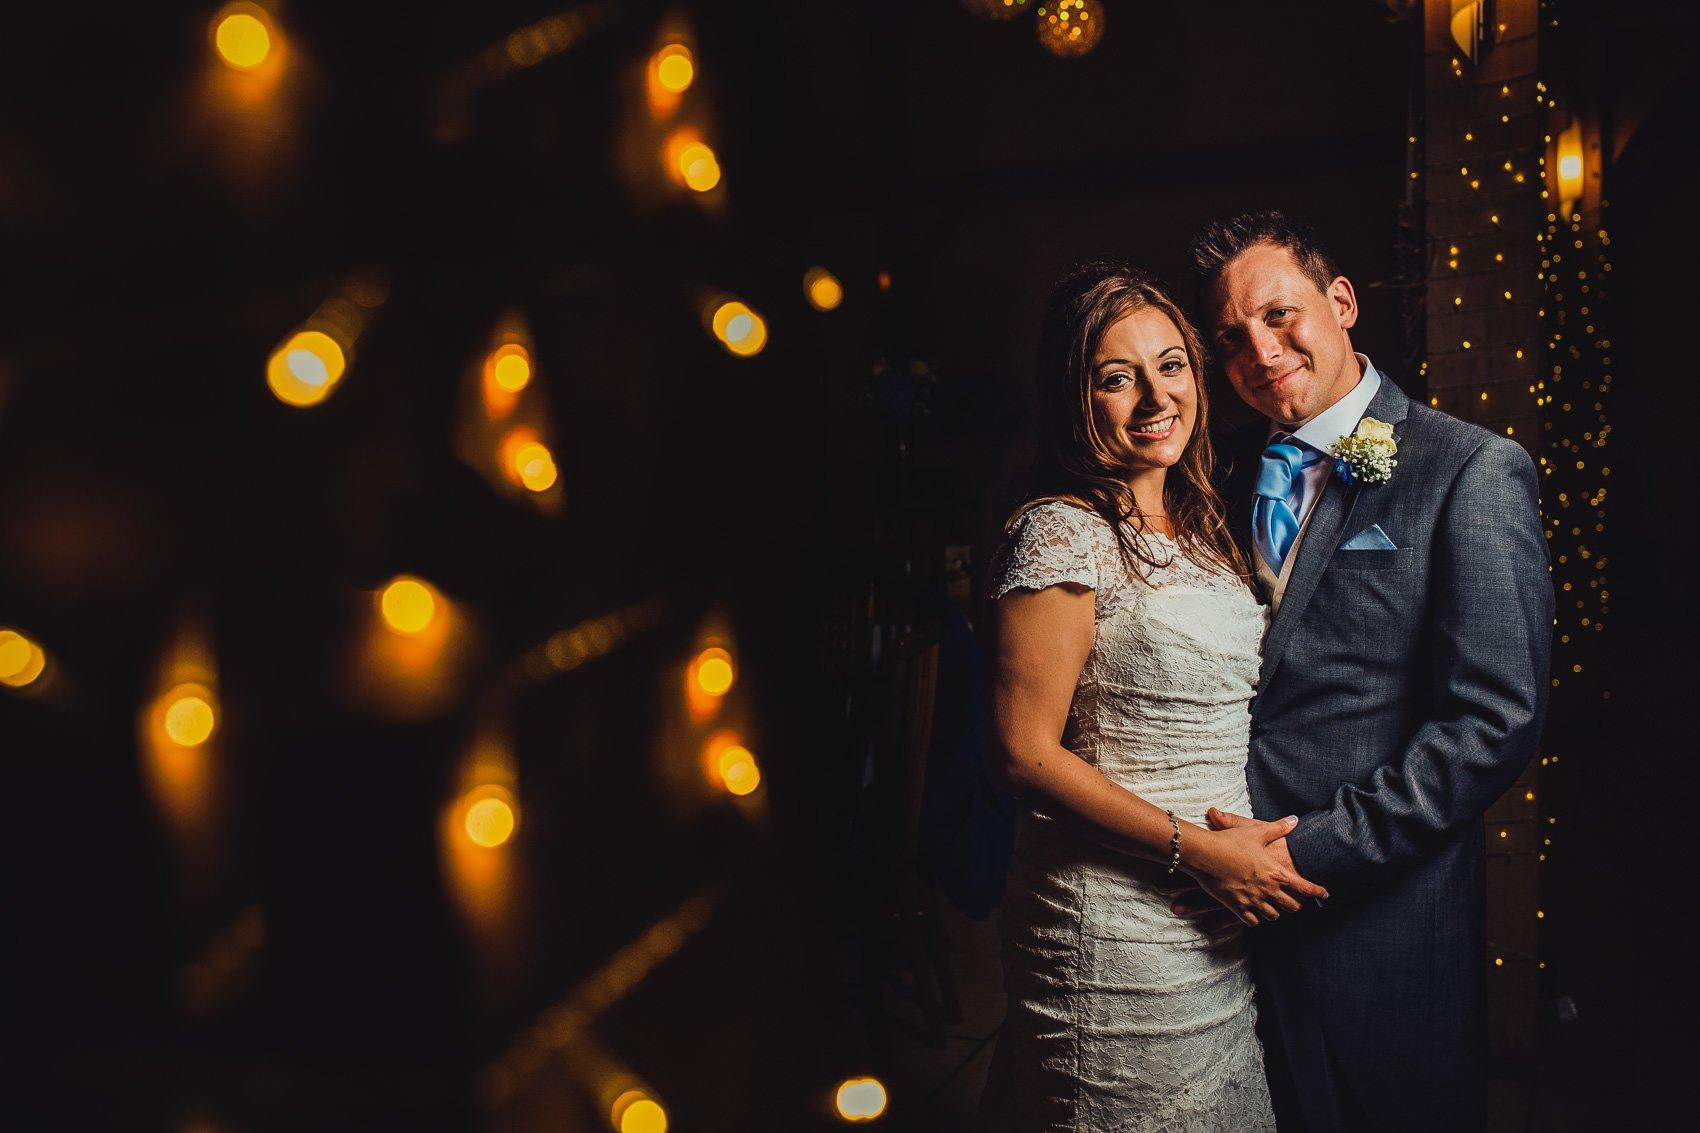 Rivervale Barn Wedding Photographer - Oli and Leyla 50